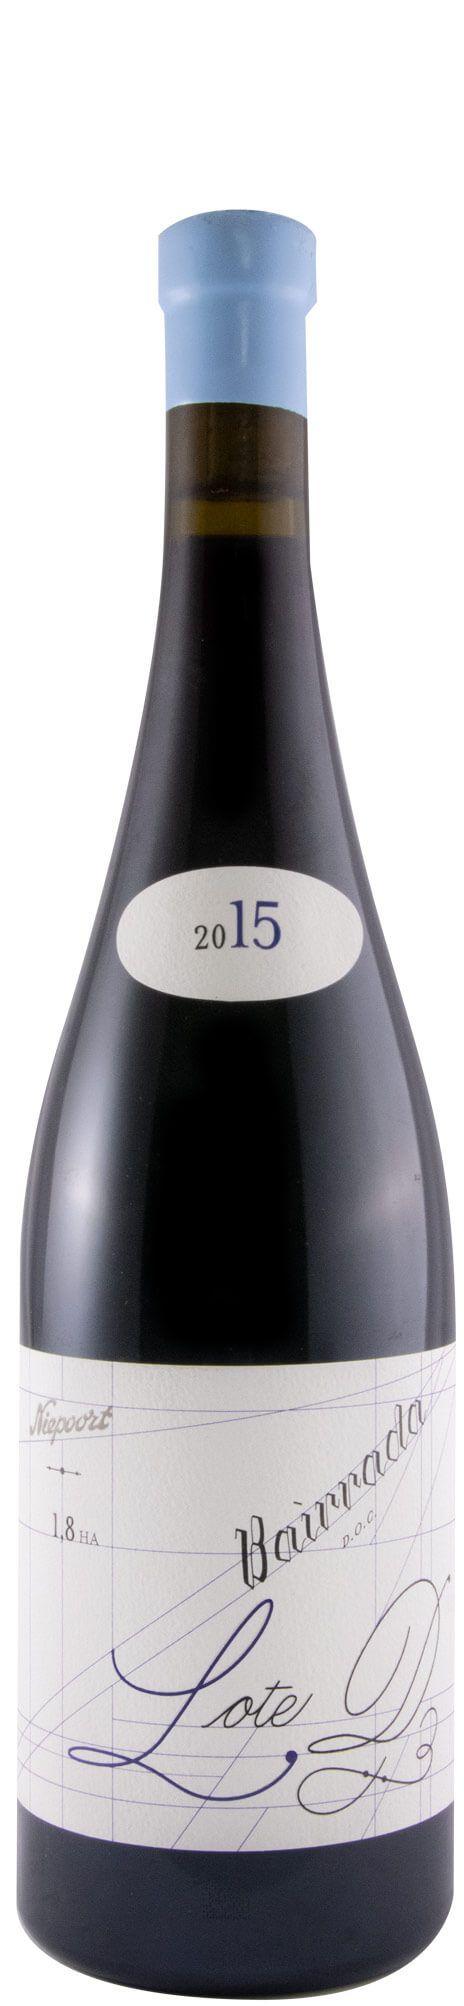 2015 Niepoort Lote D tinto